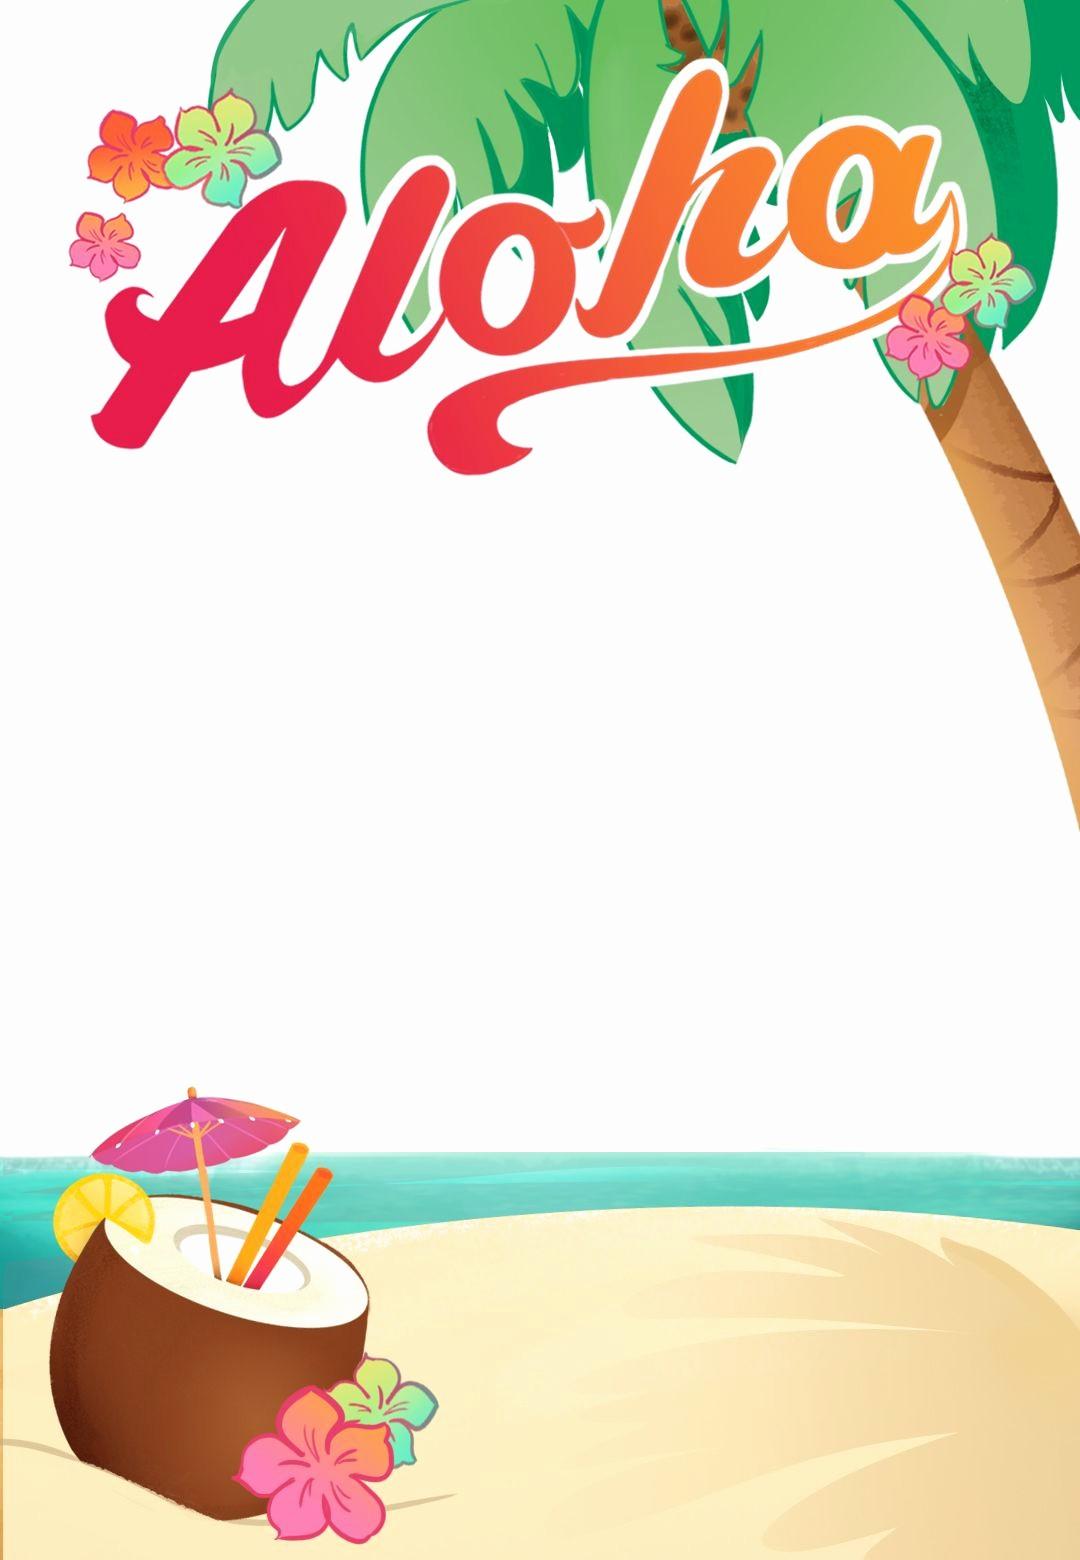 Hawaiian Party Invitation Template Free Elegant Luau Party Free Printable Summer Party Invitation